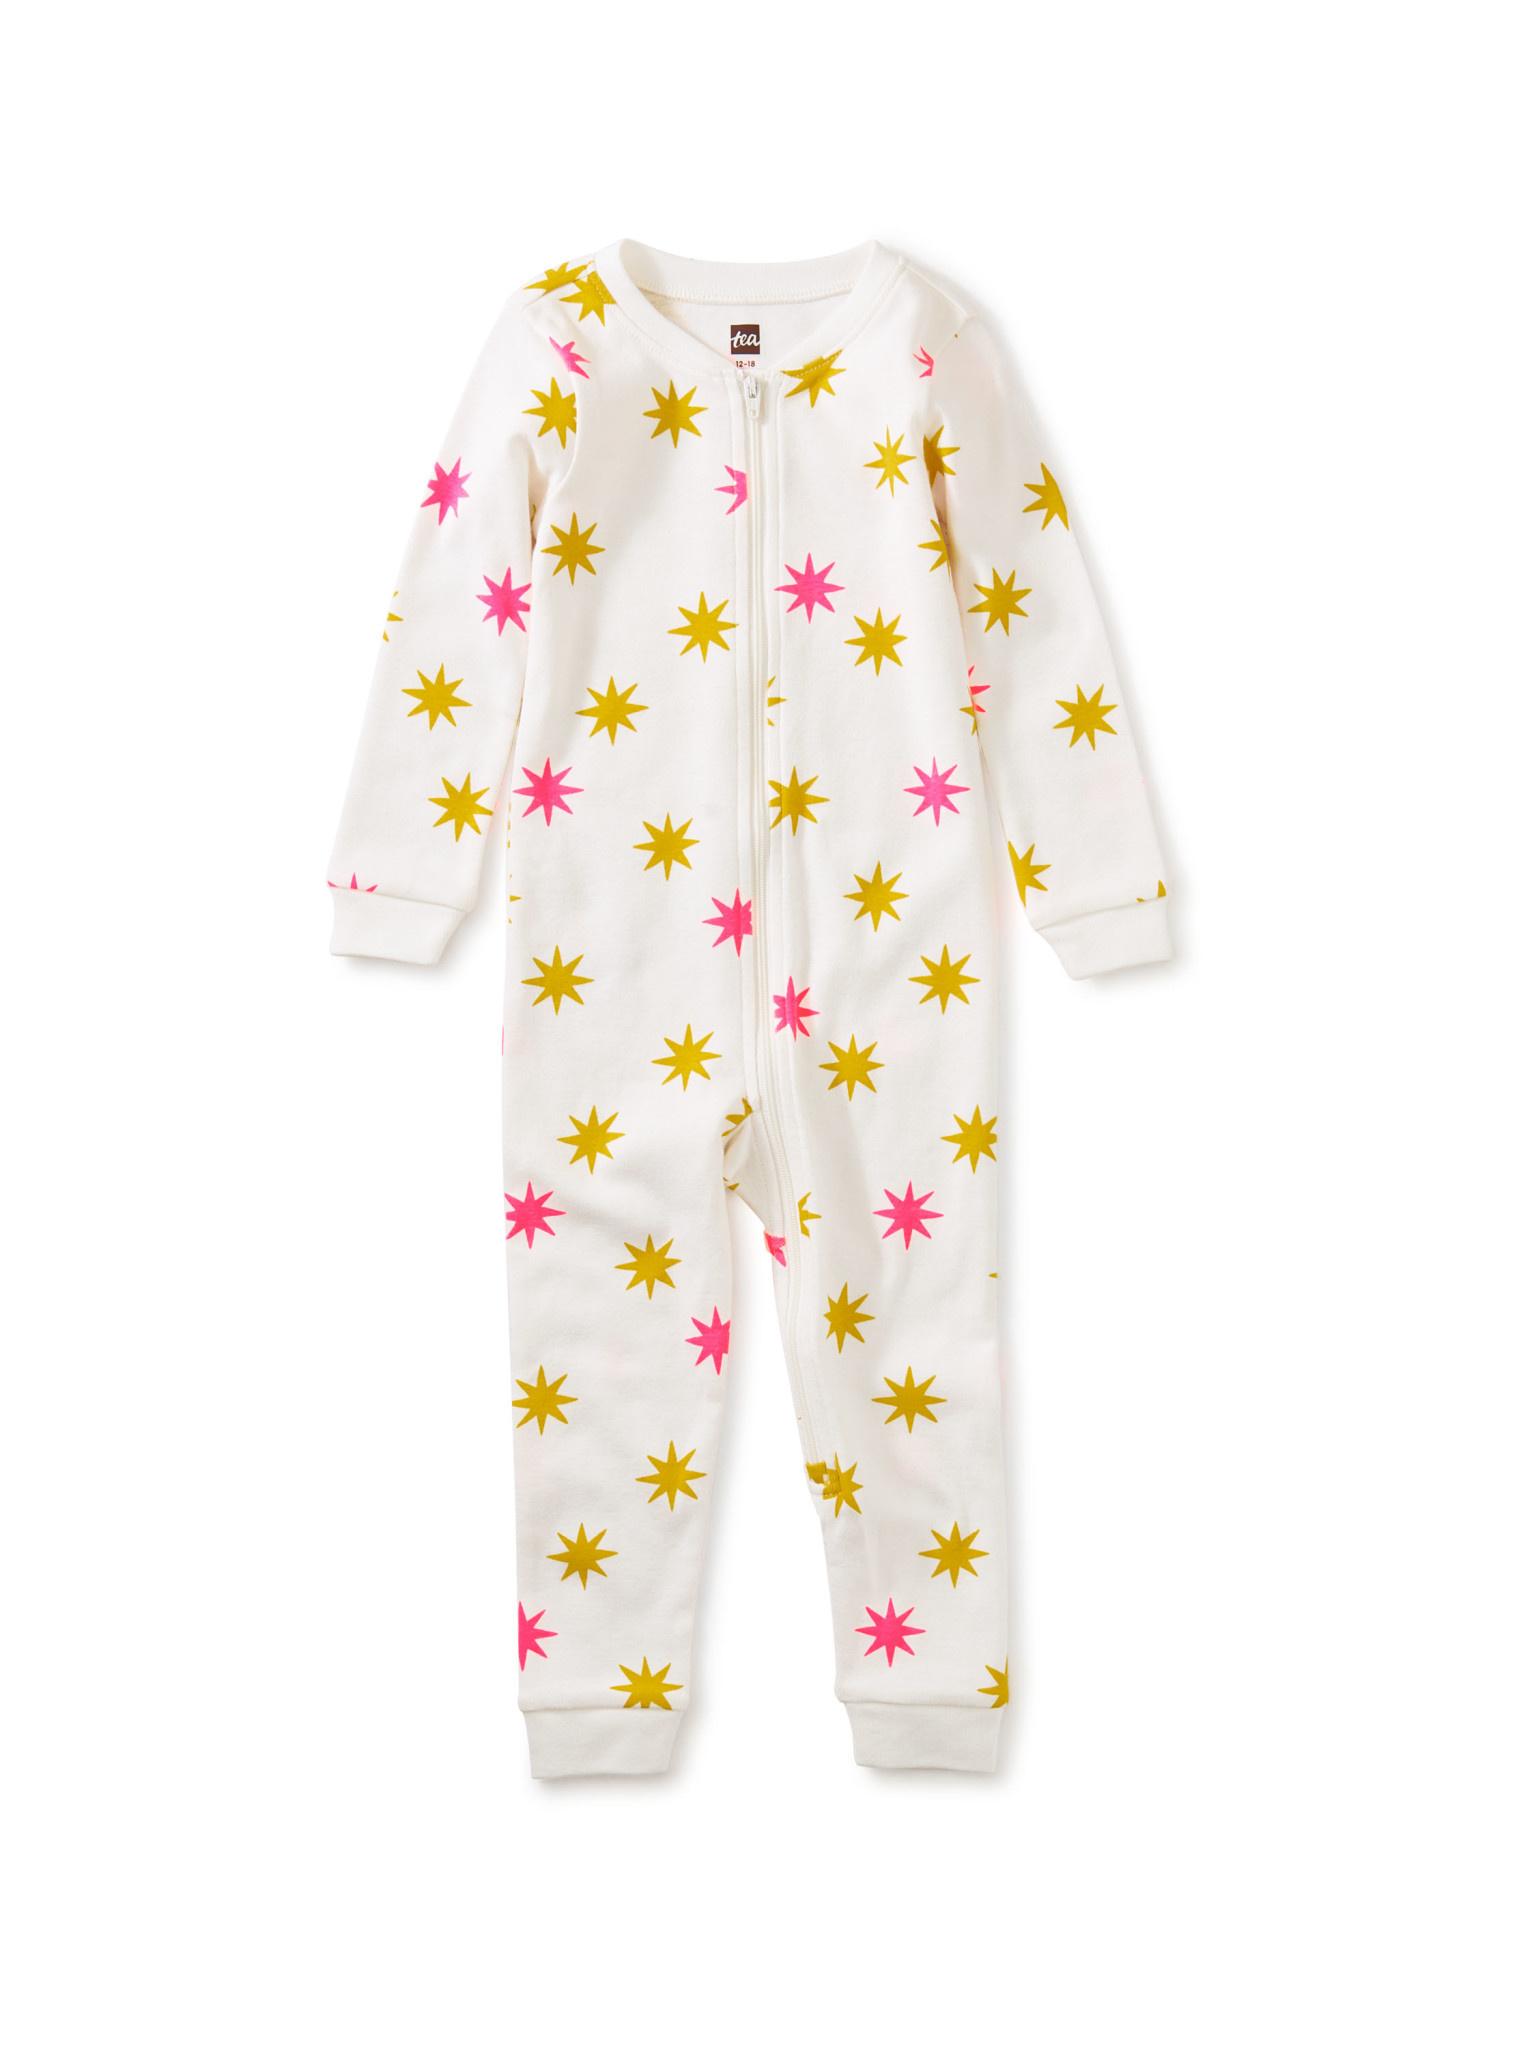 Tea Collection Sleep Tight Baby Pajamas - Nautical Stars